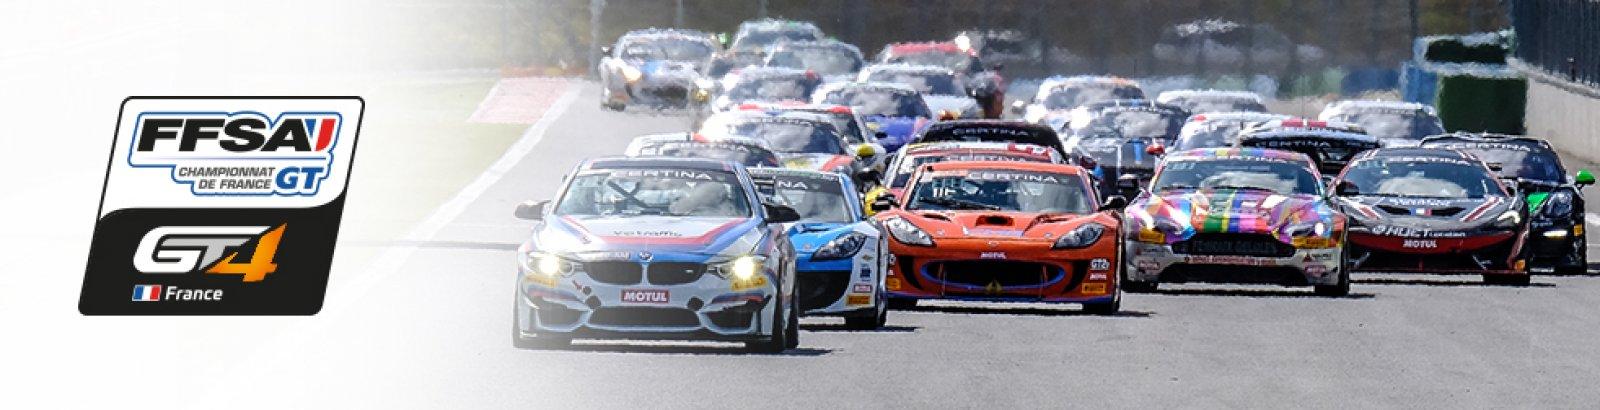 Championnat de France FFSA GT - GT4 France Image